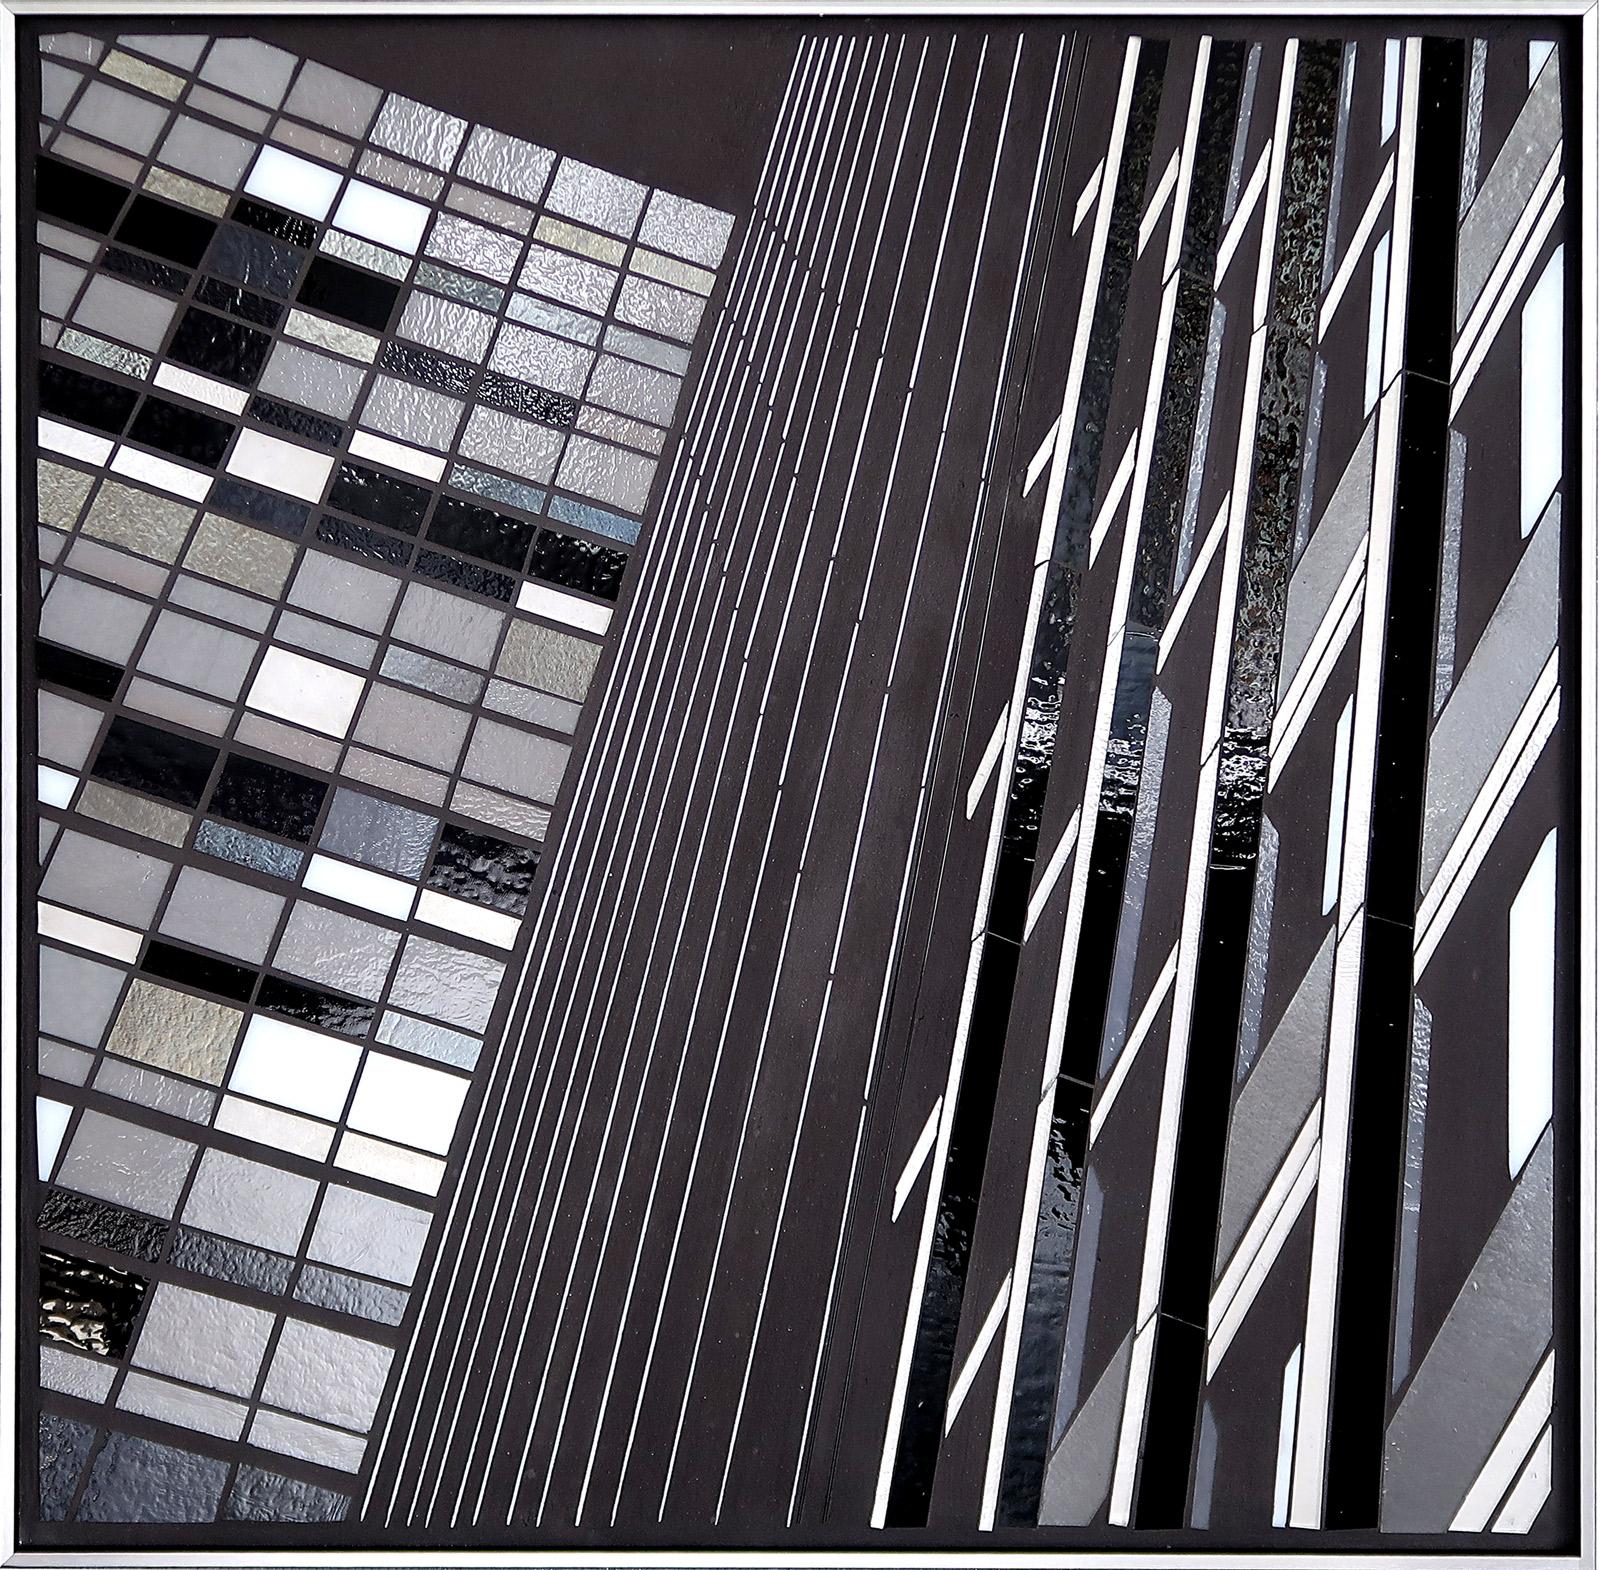 Reflect 1.37a Cityview